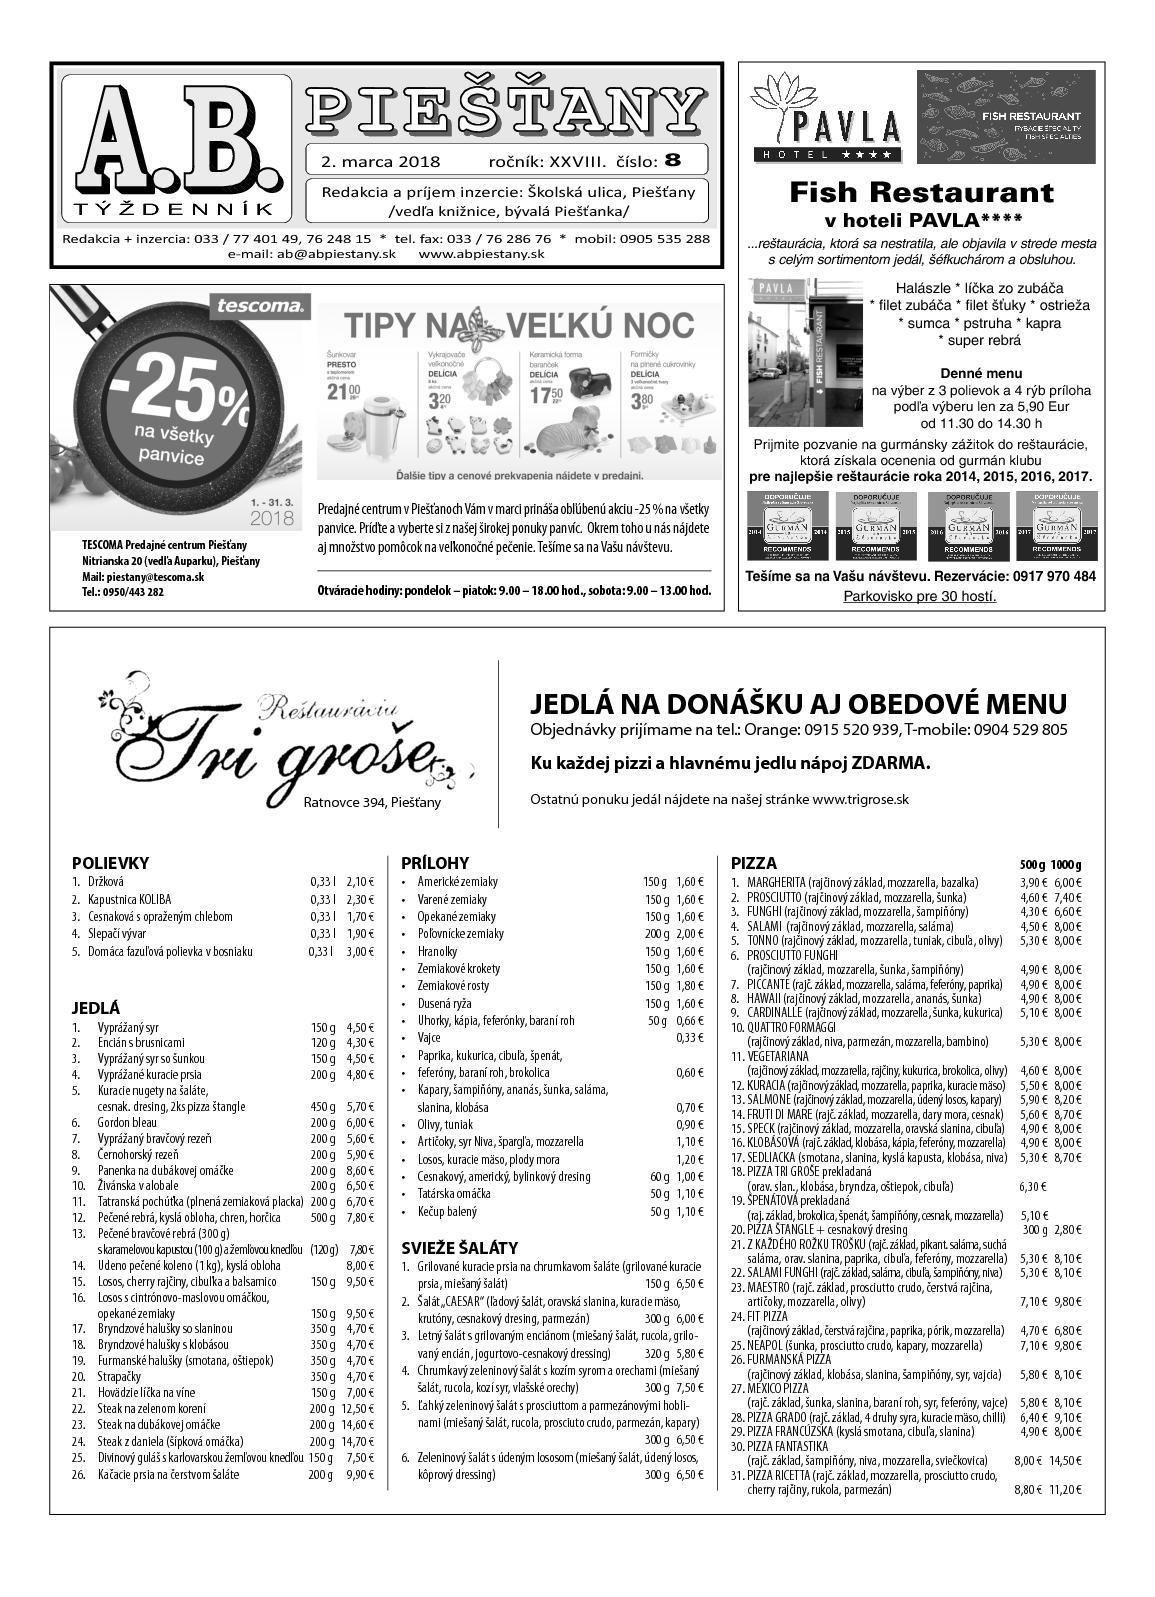 dátumové údaje lokalít e-commerce